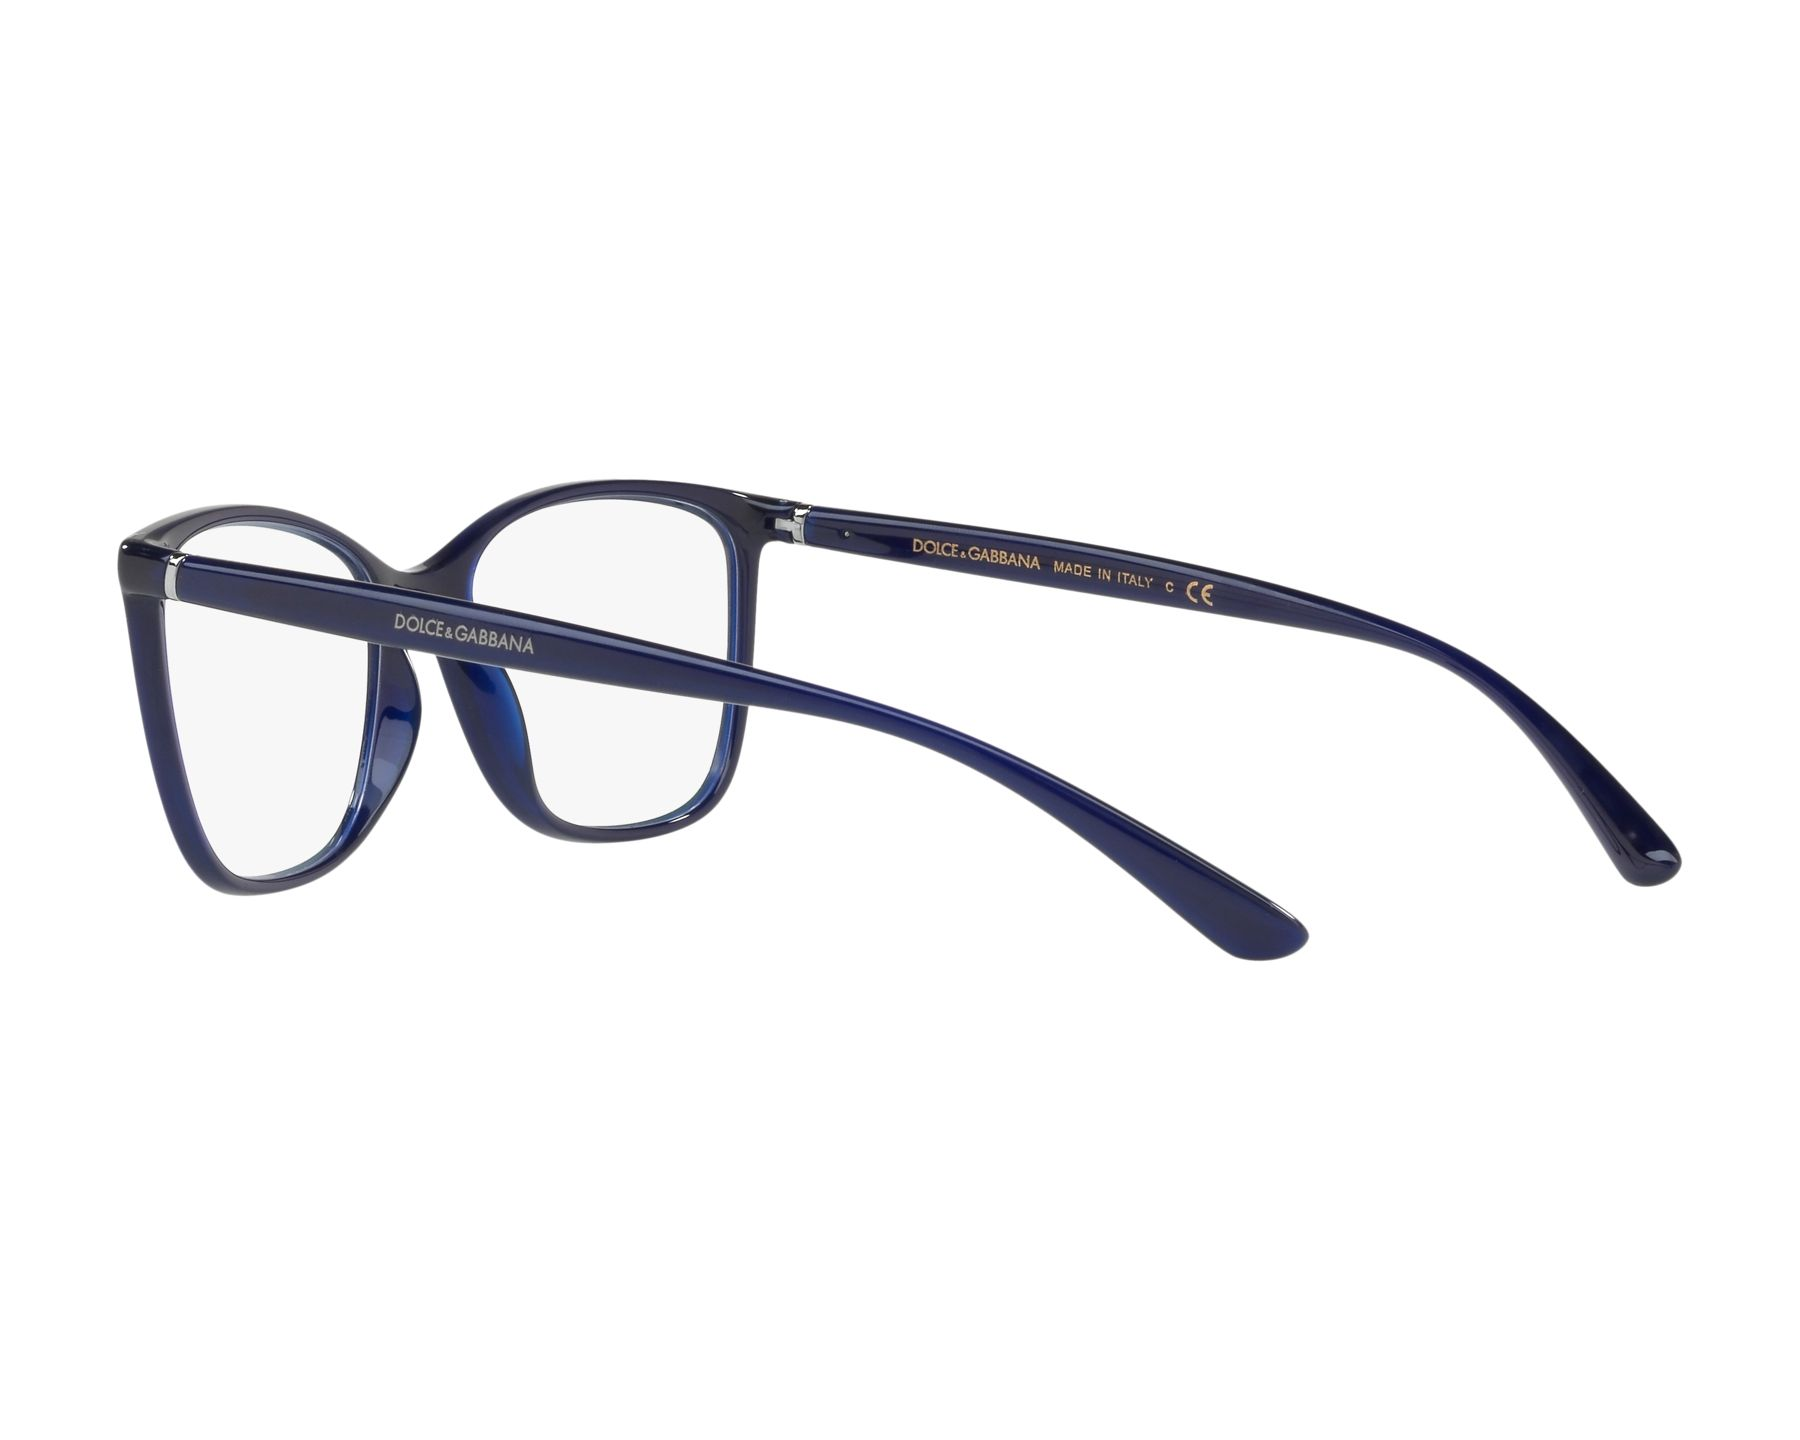 cb11d78b85e eyeglasses Dolce   Gabbana DG-5026 3094 54-17 Blue 360 degree view 5